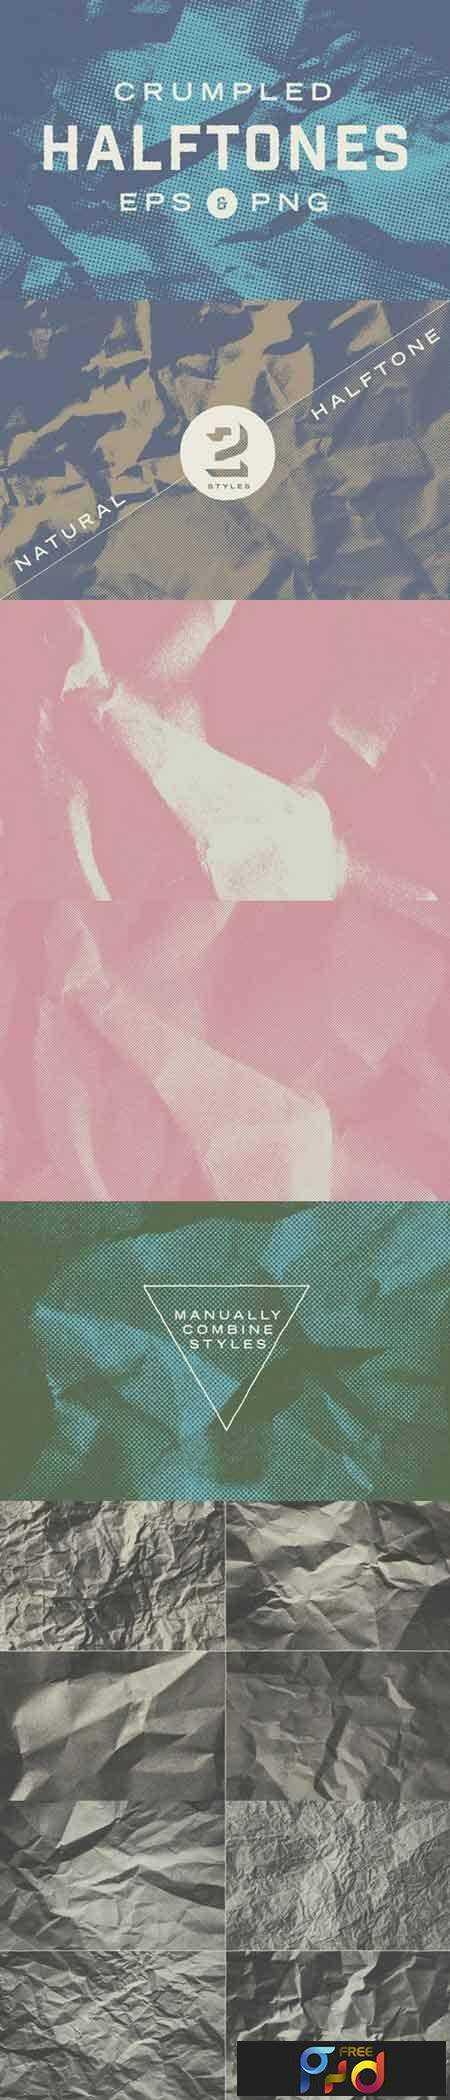 FreePsdVn.com_VECTOR_1701202_15_crumpled_paper_halftone_textures_180619